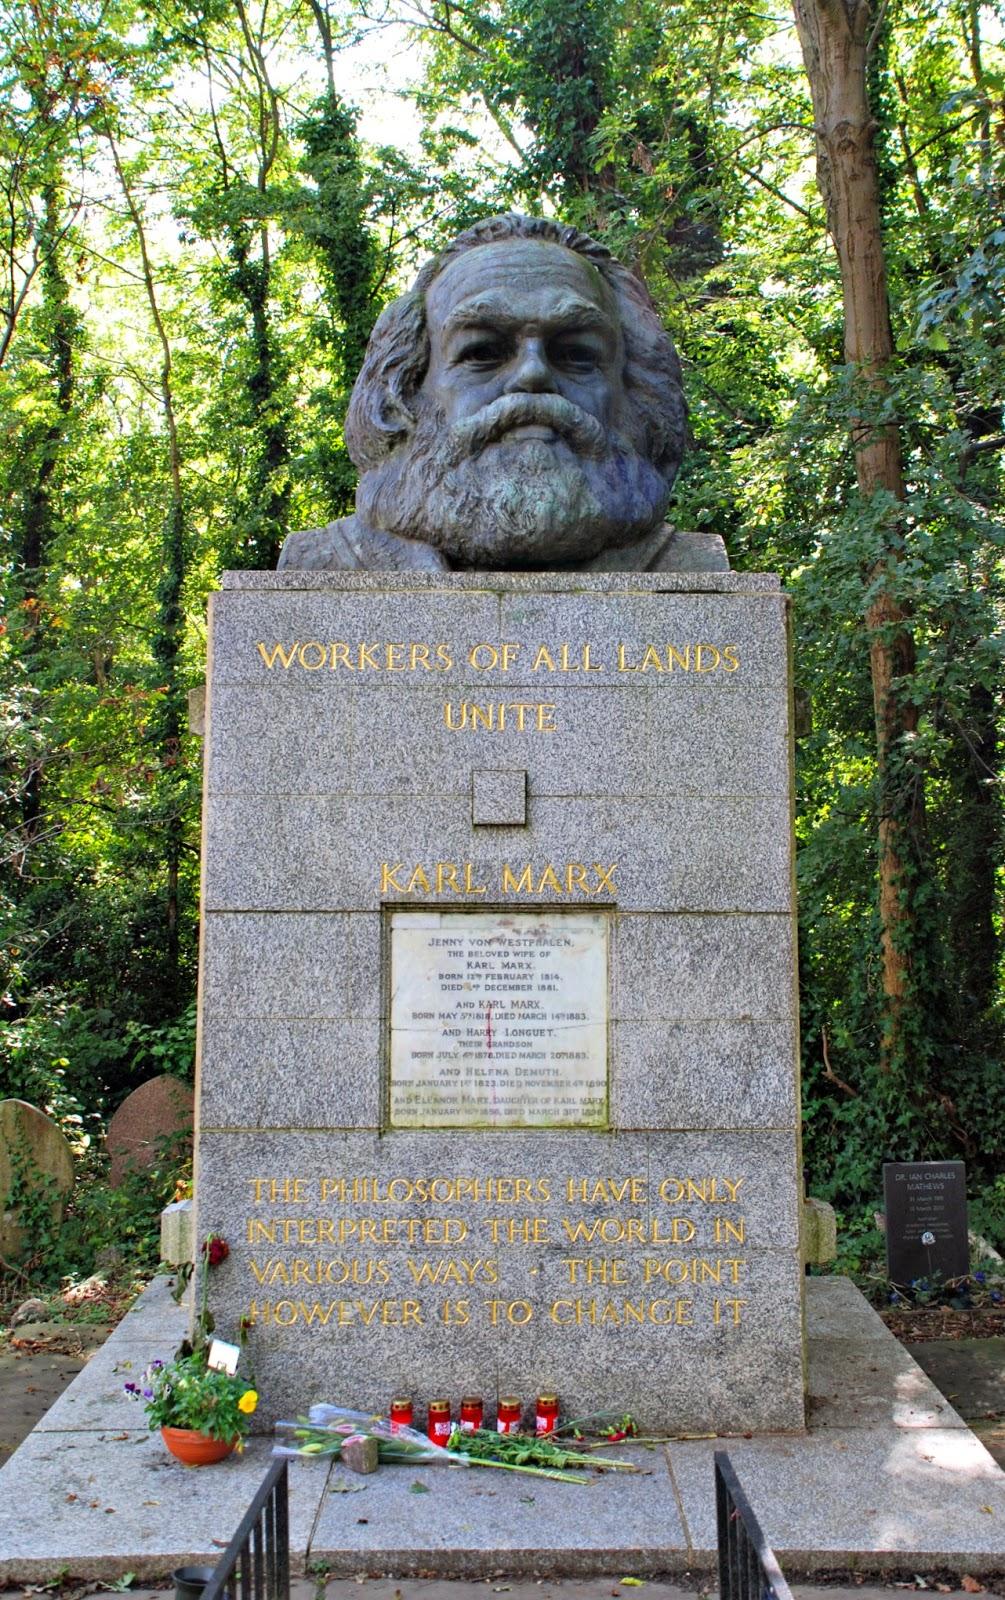 Karl Marx's memorial, Highgate Cemetery, London